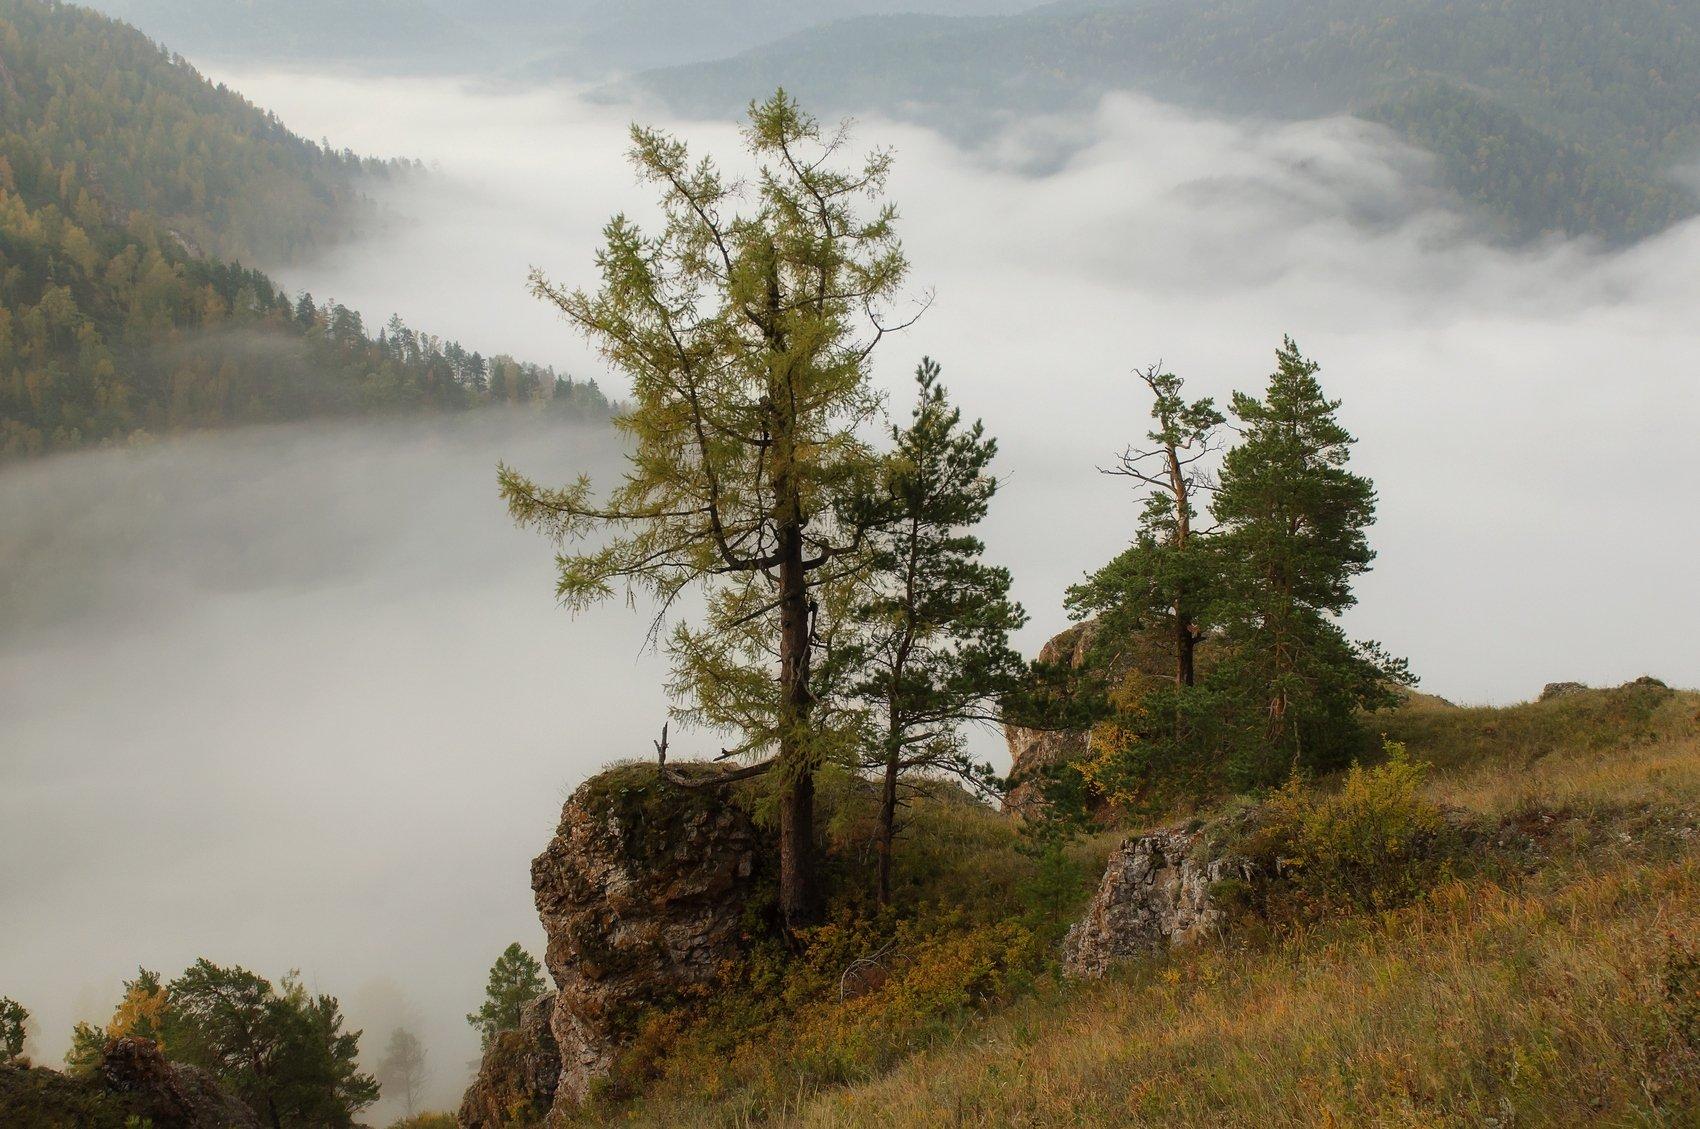 торгашинский хребет. склон. туман., Марина Фомина.